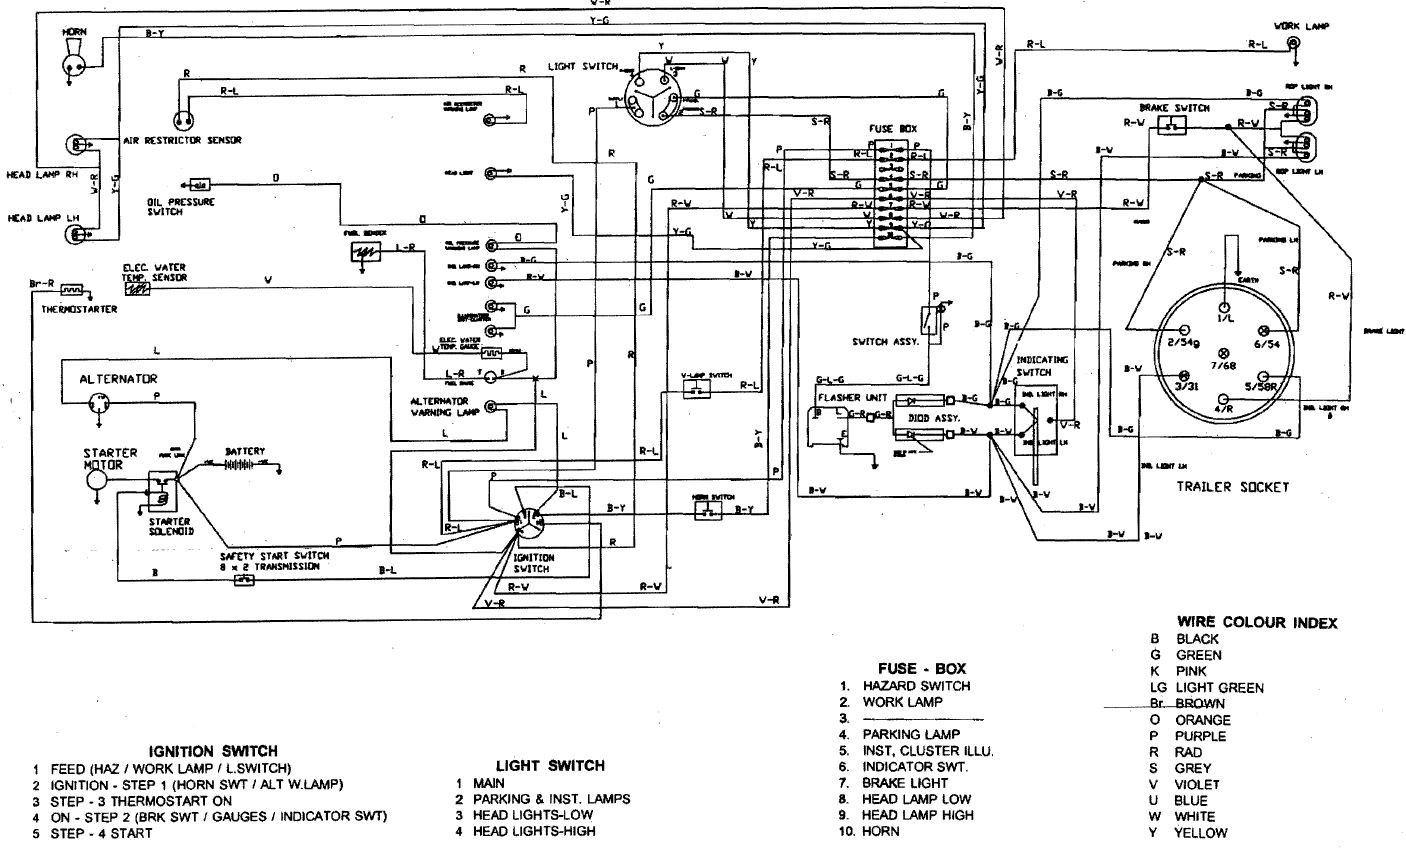 Engine Wiring Tractor Diesel Ignition Switch Wiring Diagram Engine Carling Tractor Diesel Ignition Switch Wiring Diagram